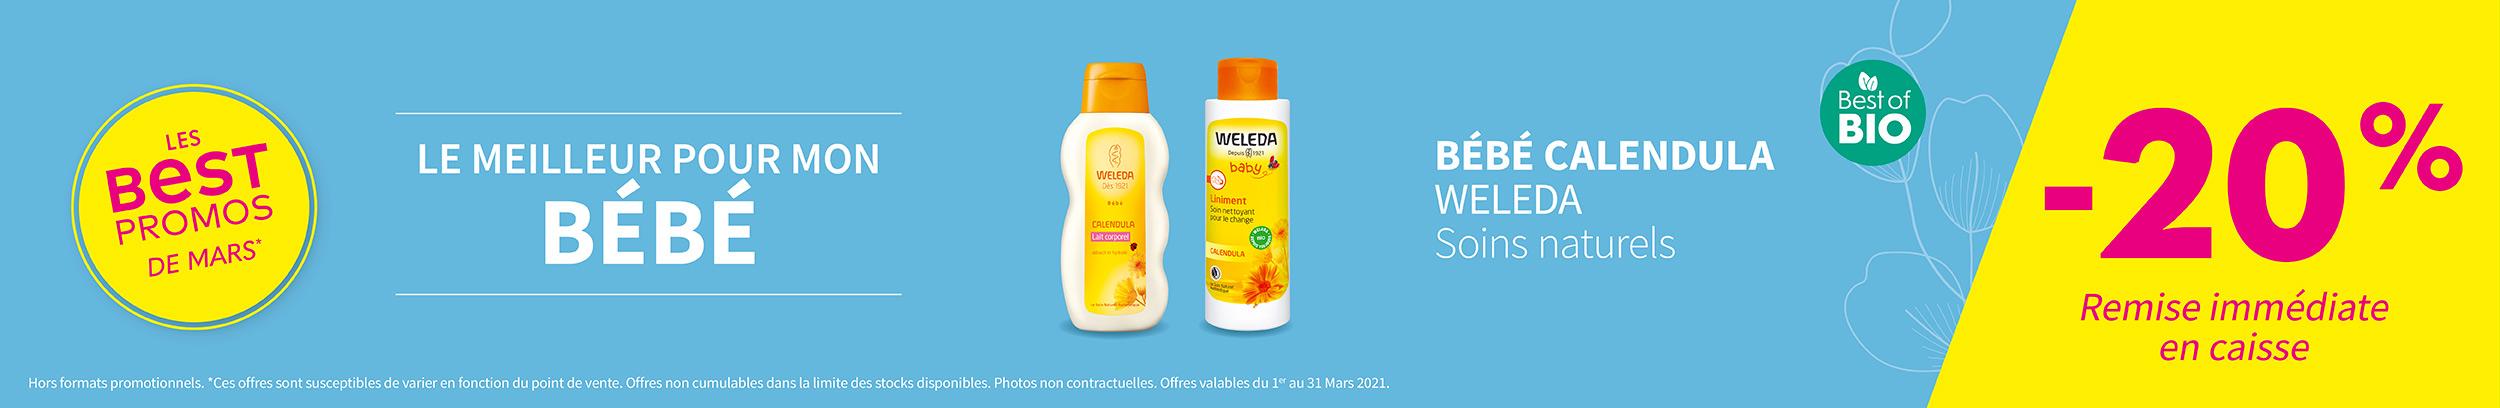 BÉBÉ CALENDULA - WELEDA - Soins naturels / Best of Bio